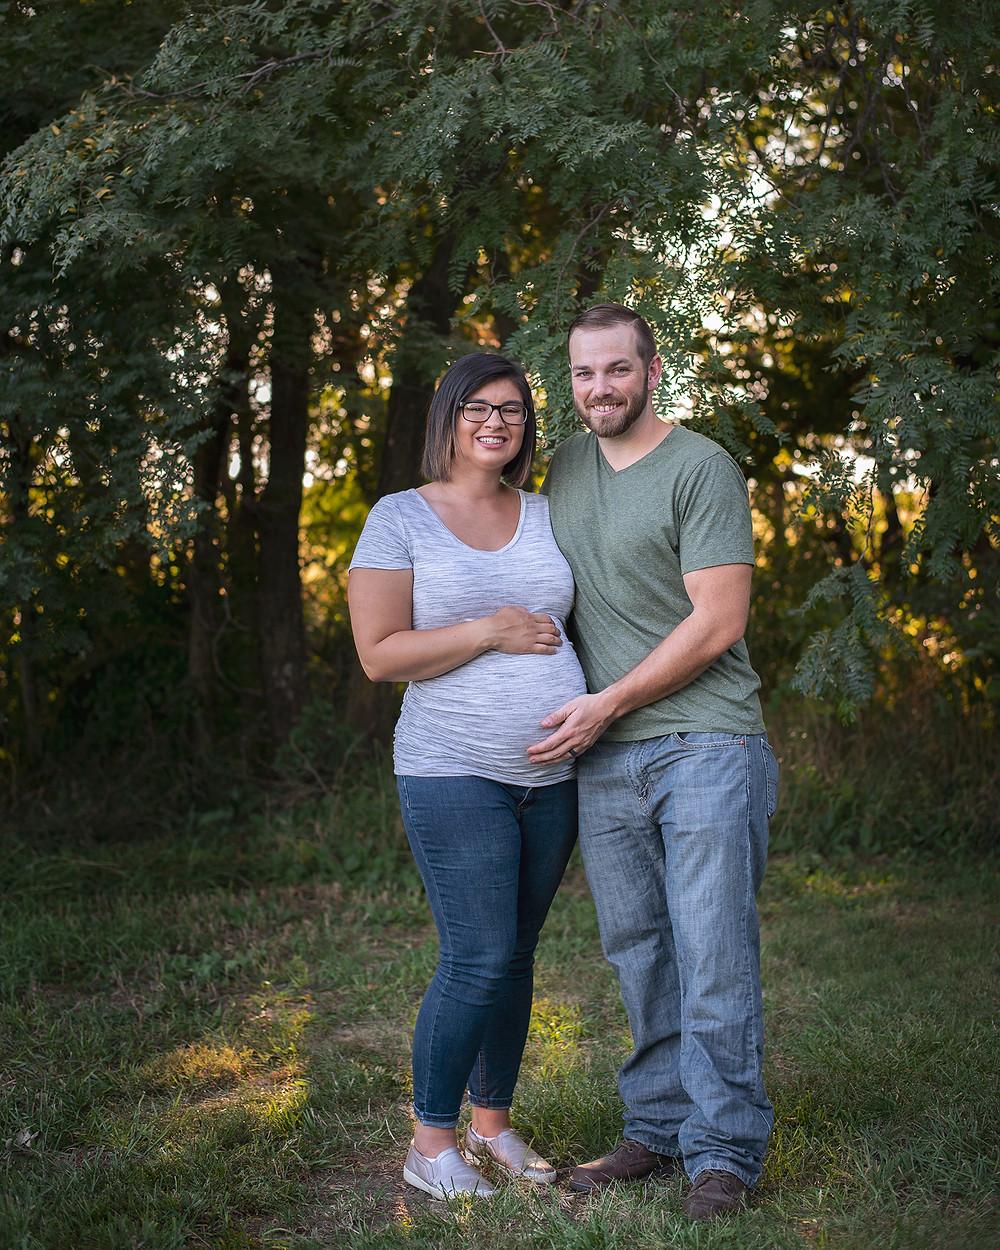 maternity session at sunset in Gretna, NE